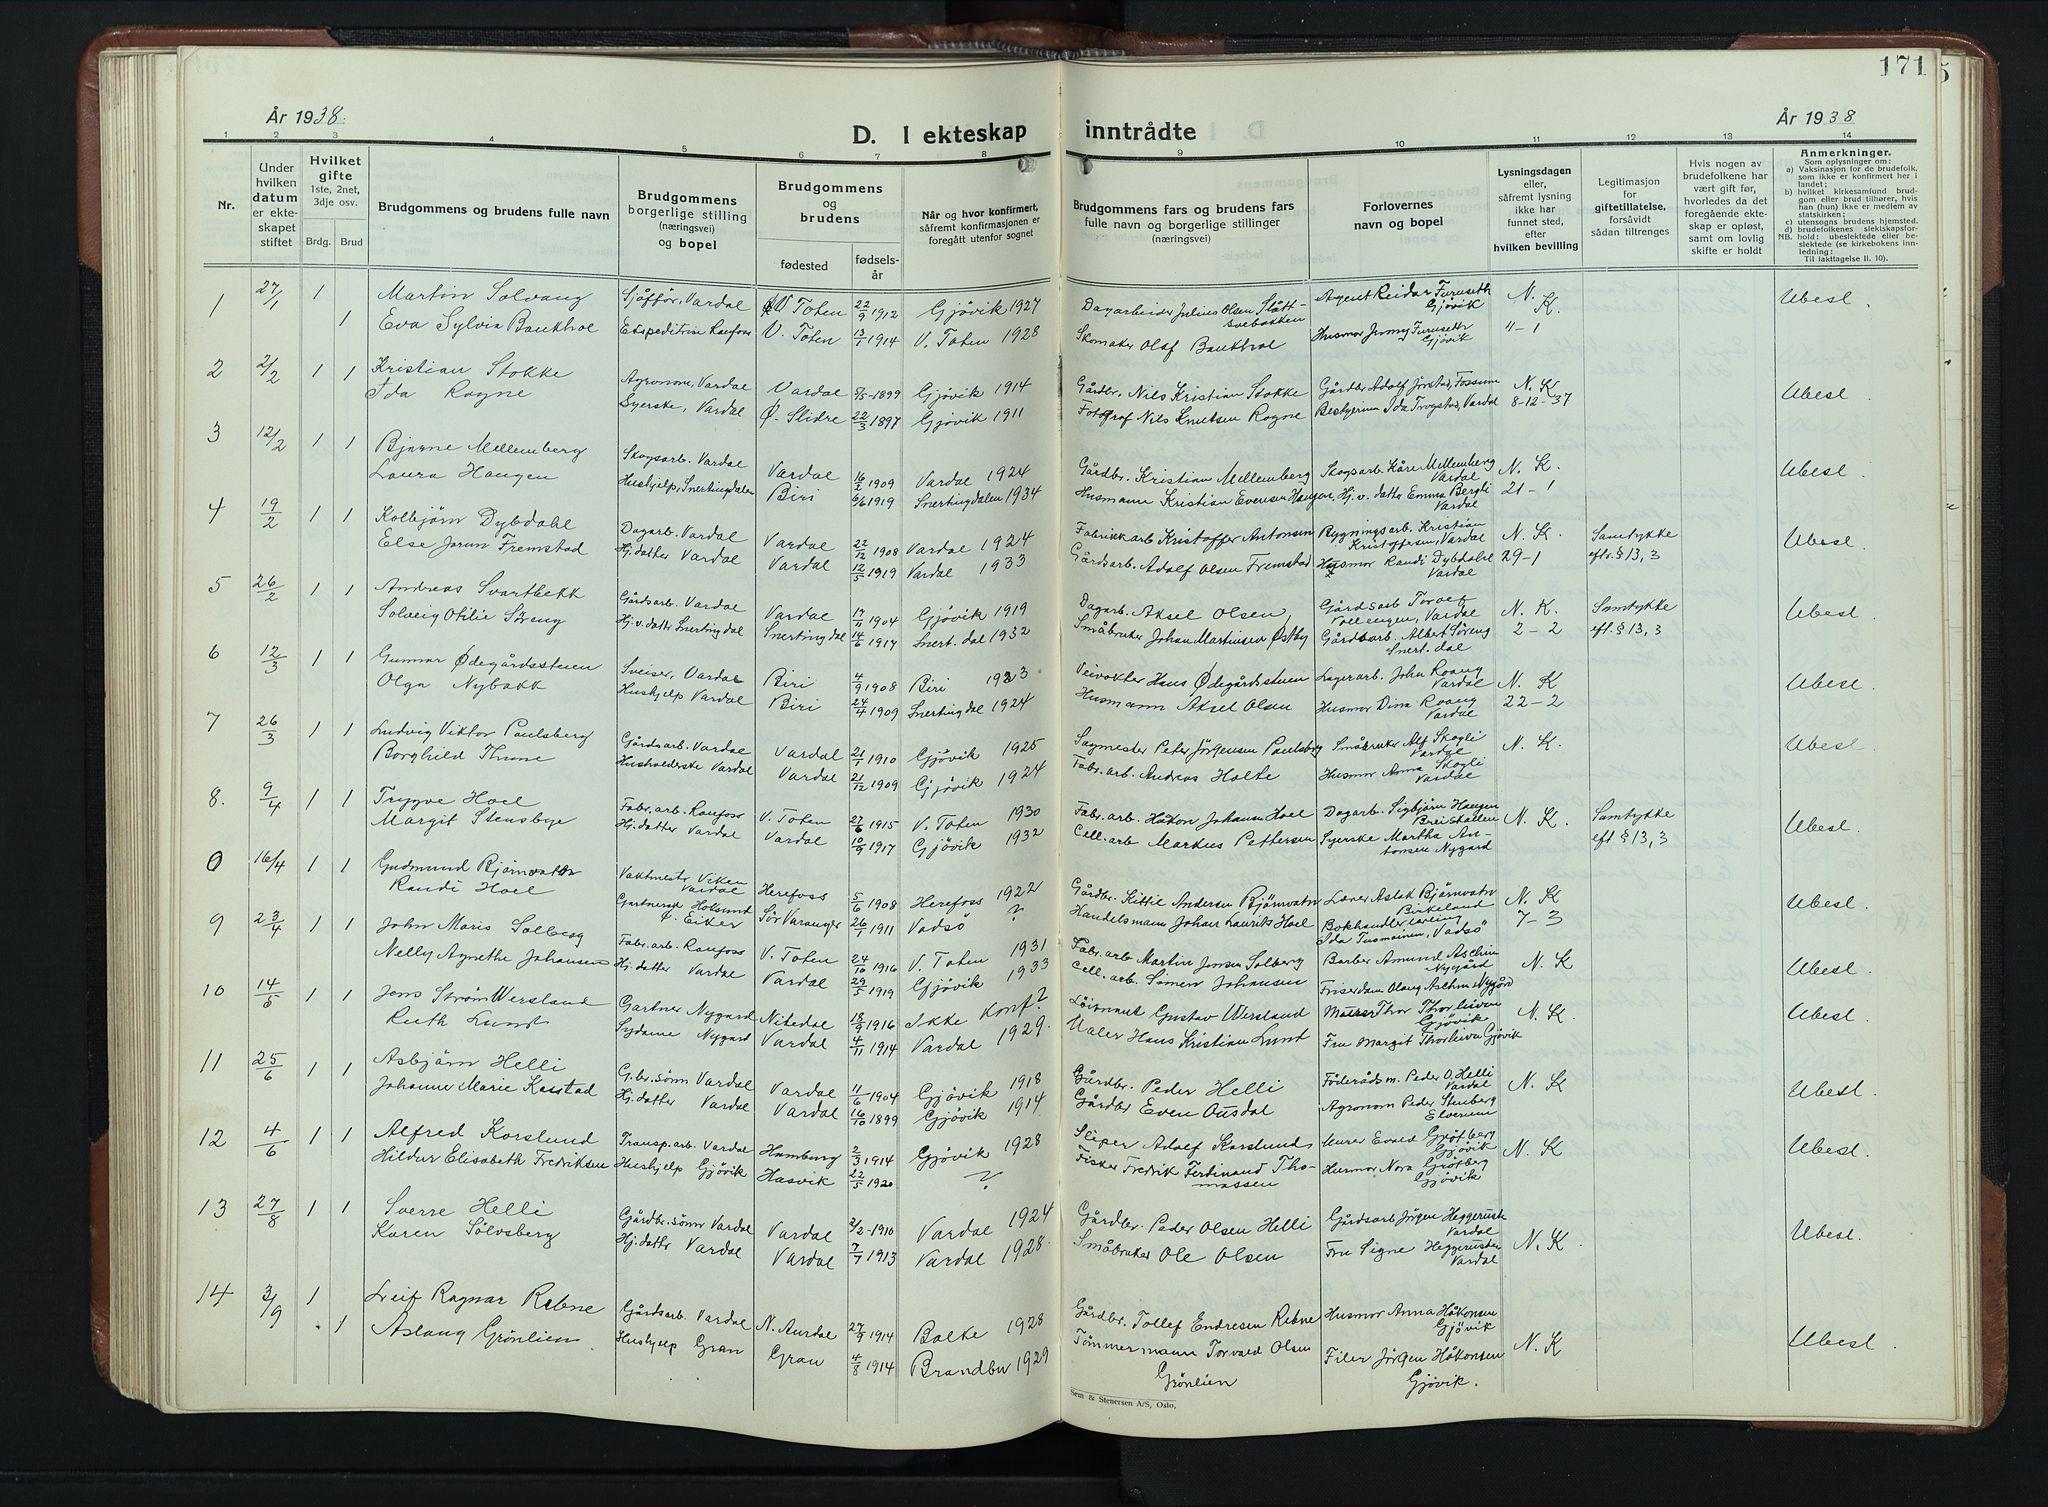 SAH, Vardal prestekontor, H/Ha/Hab/L0023: Klokkerbok nr. 23, 1929-1941, s. 171